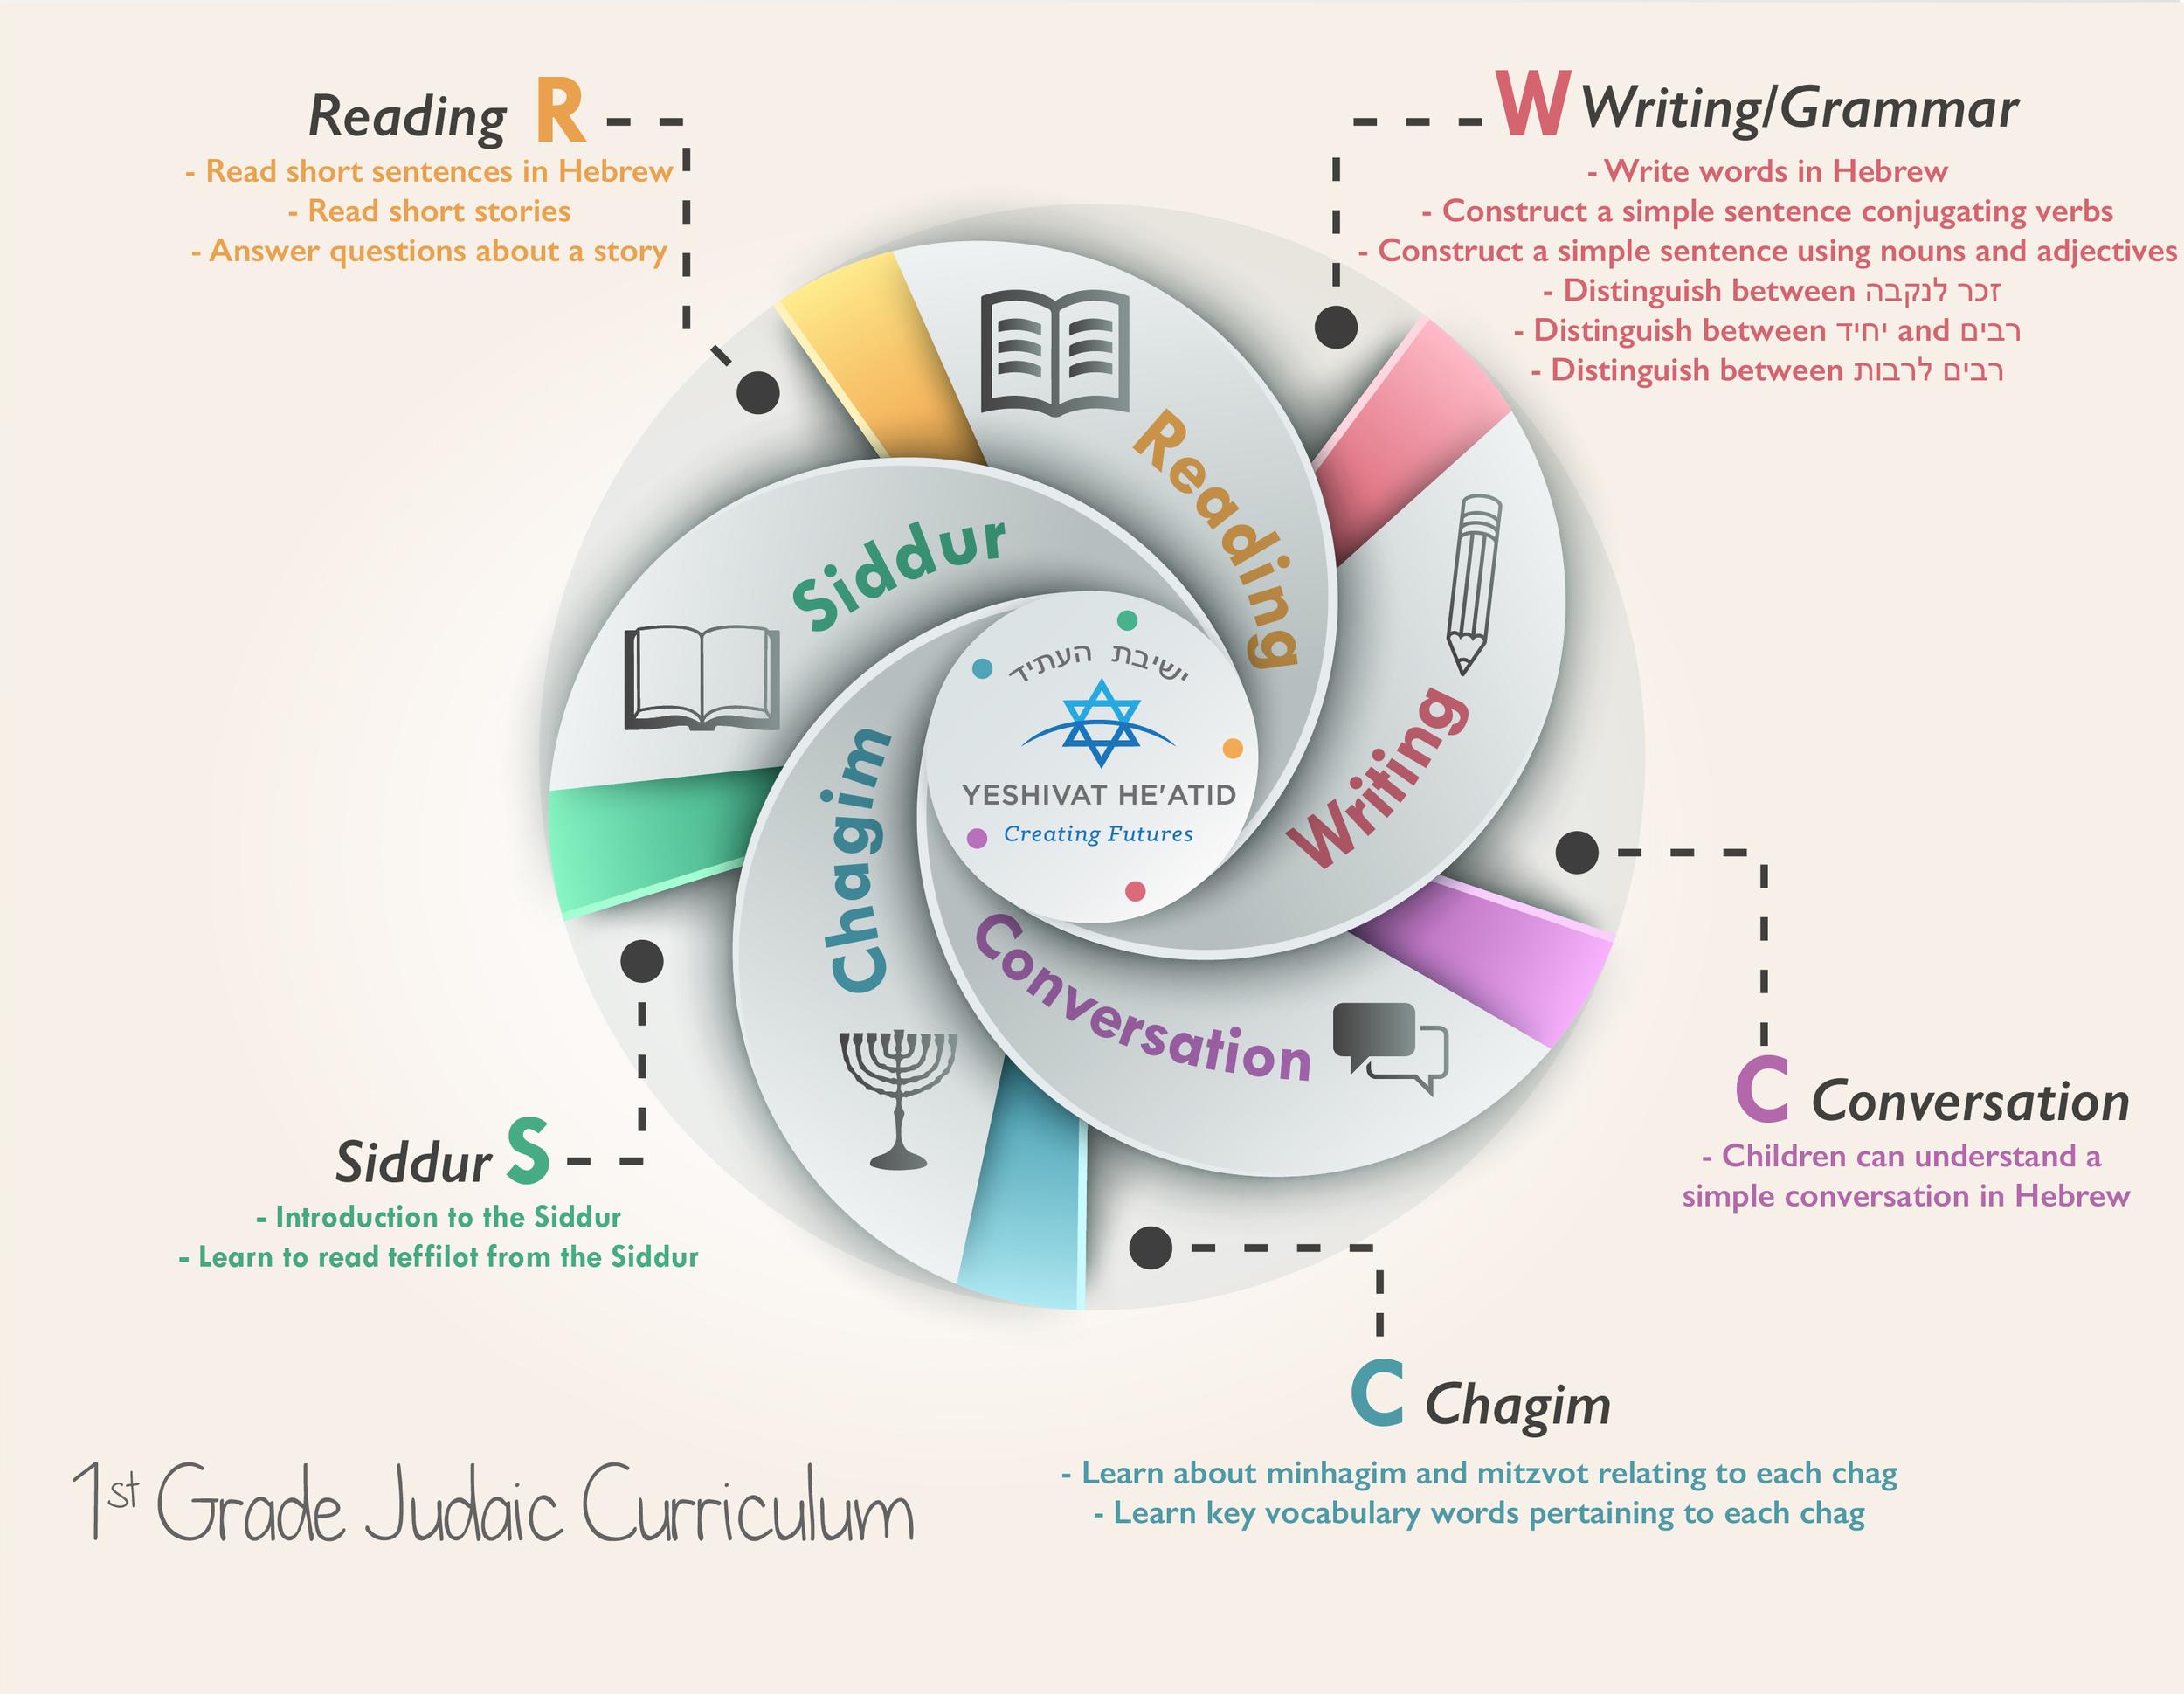 4- 1st Grade Judaic Curriculum.jpg